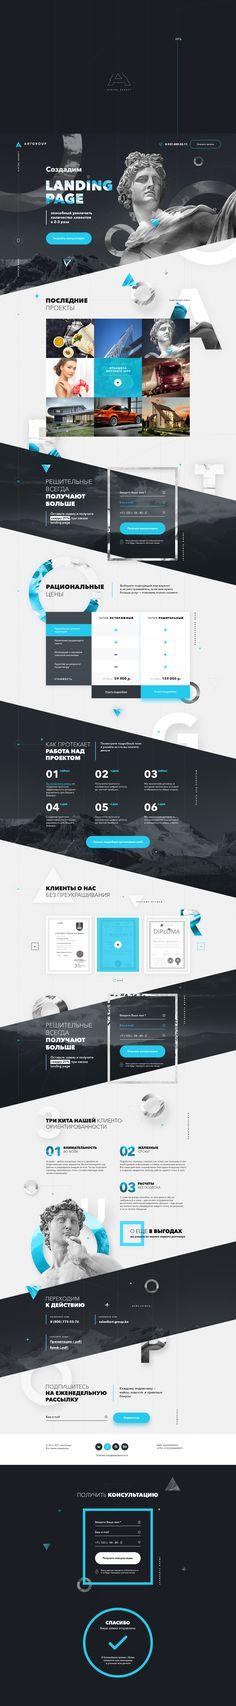 Digital Agency Art-group / Web design 2018 / Web trends